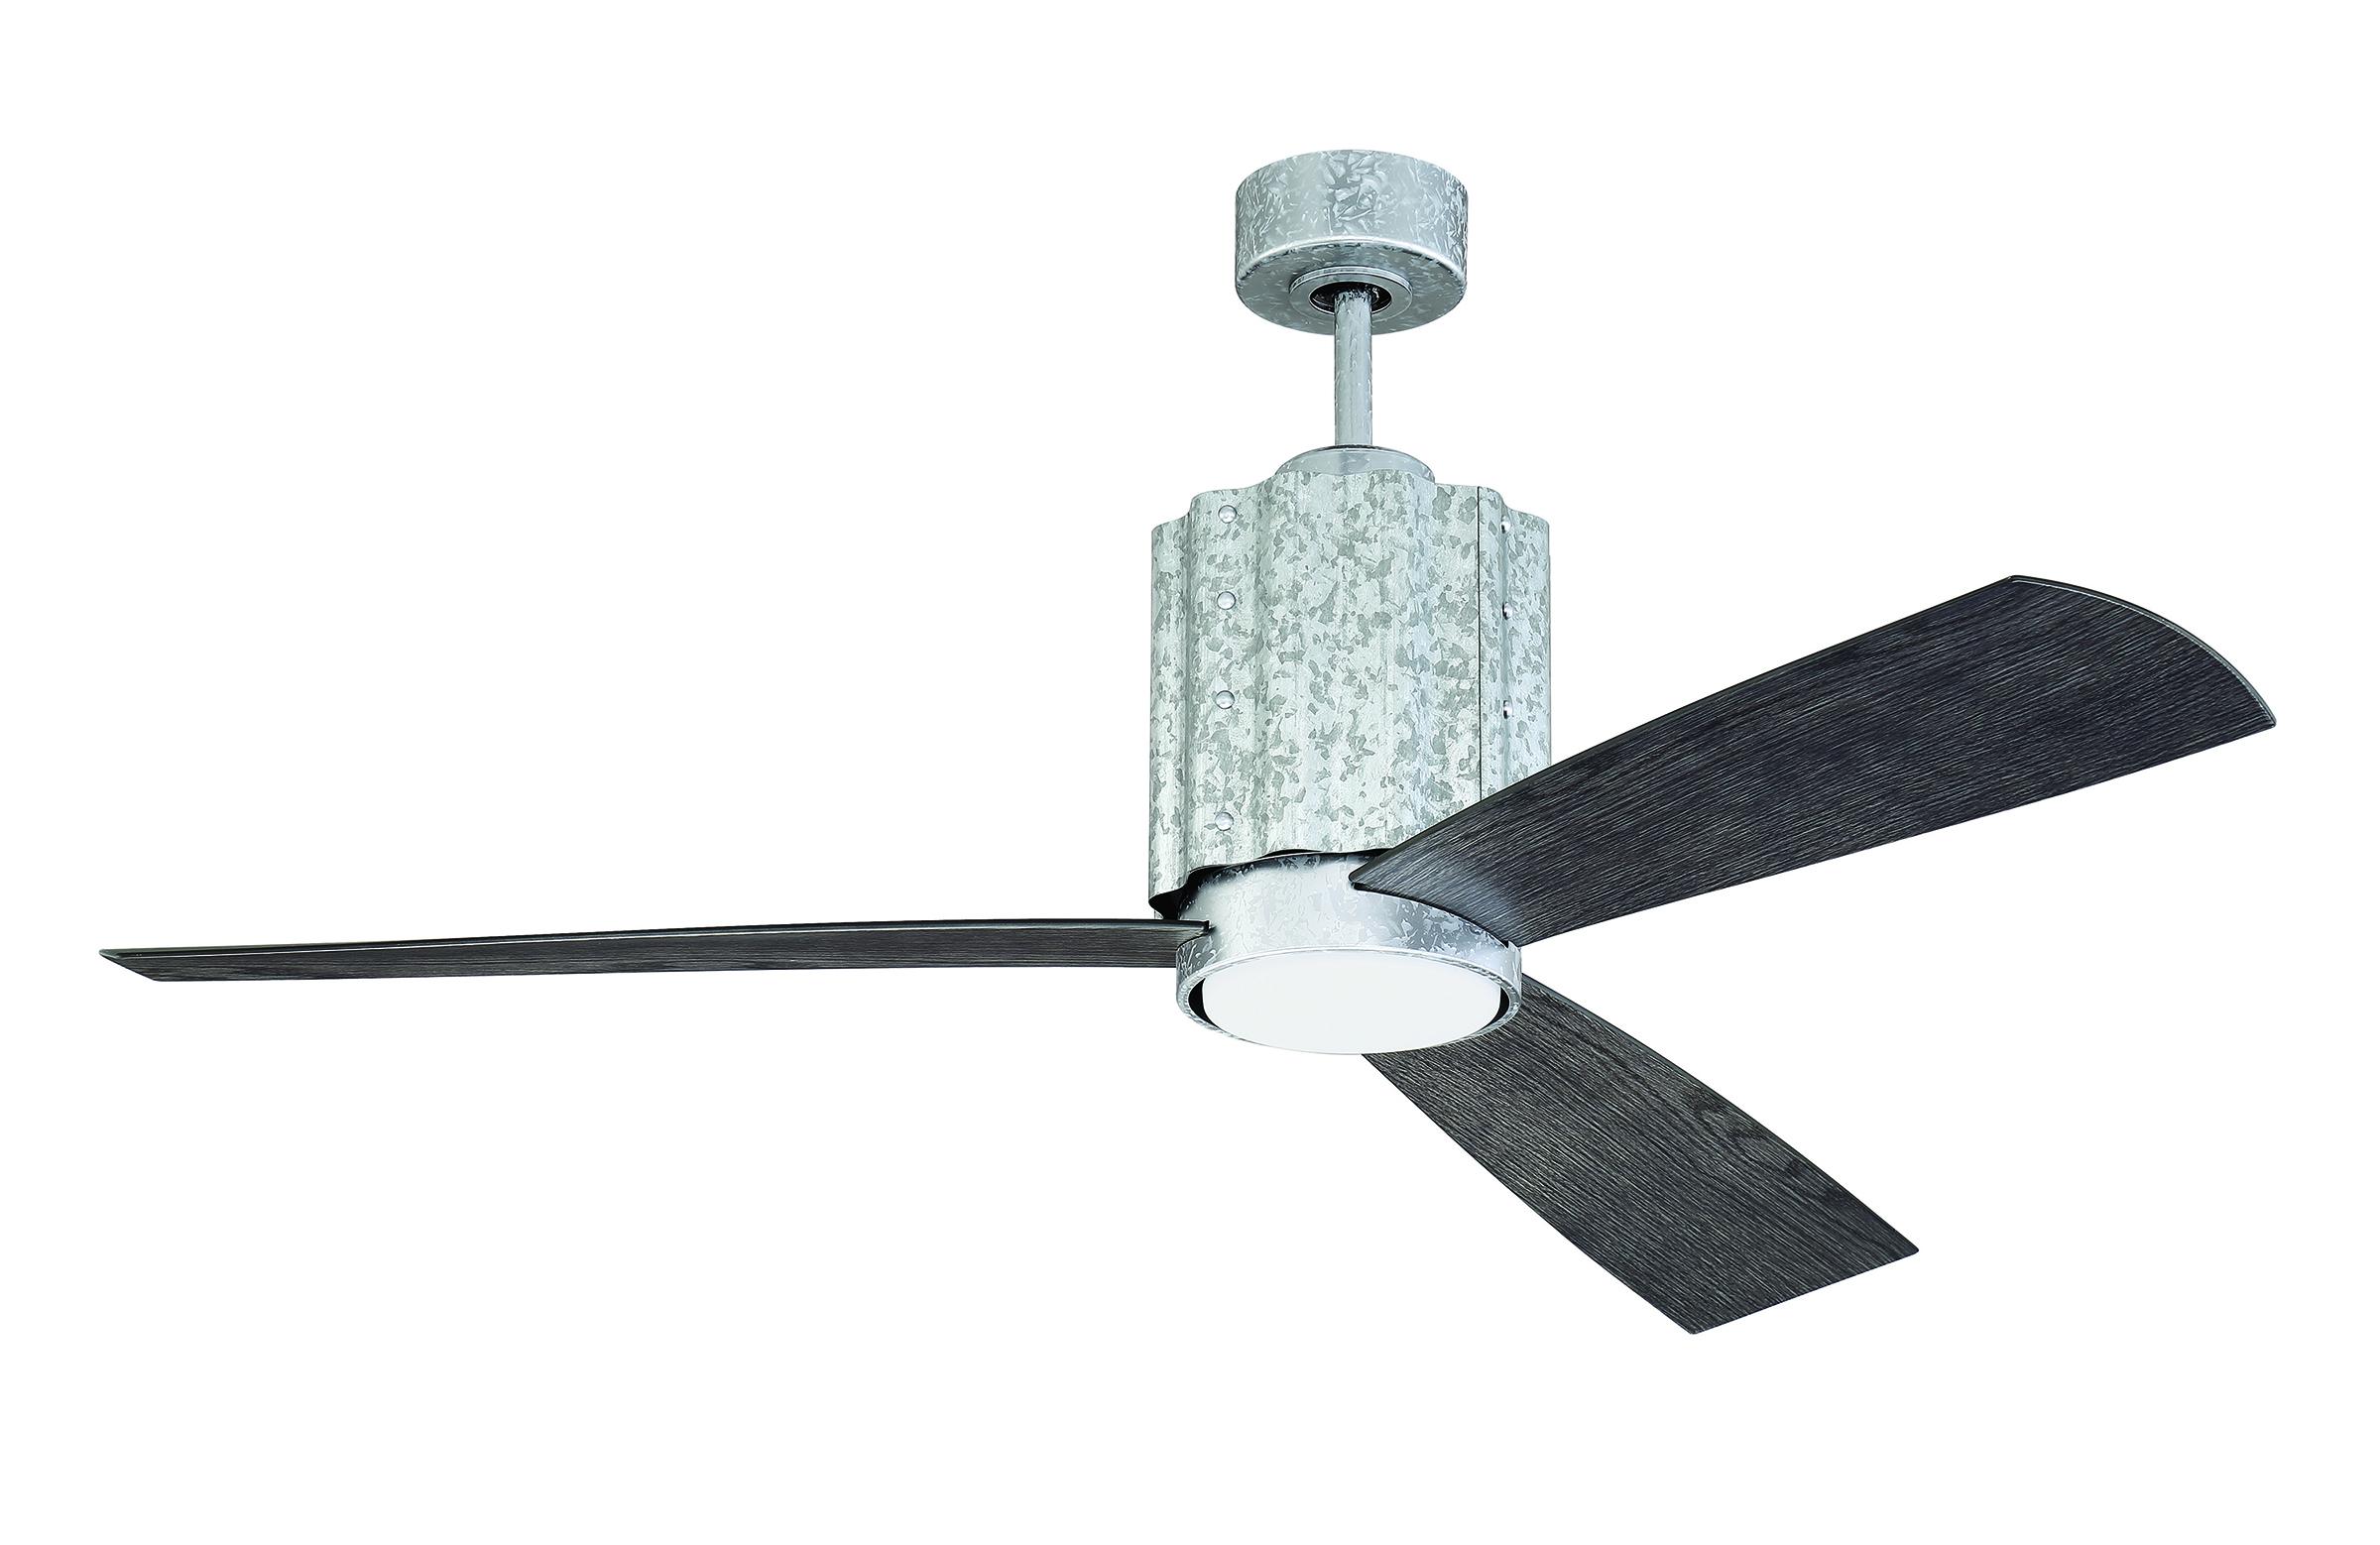 Exterior Galvanized 3 blade ceiling fan